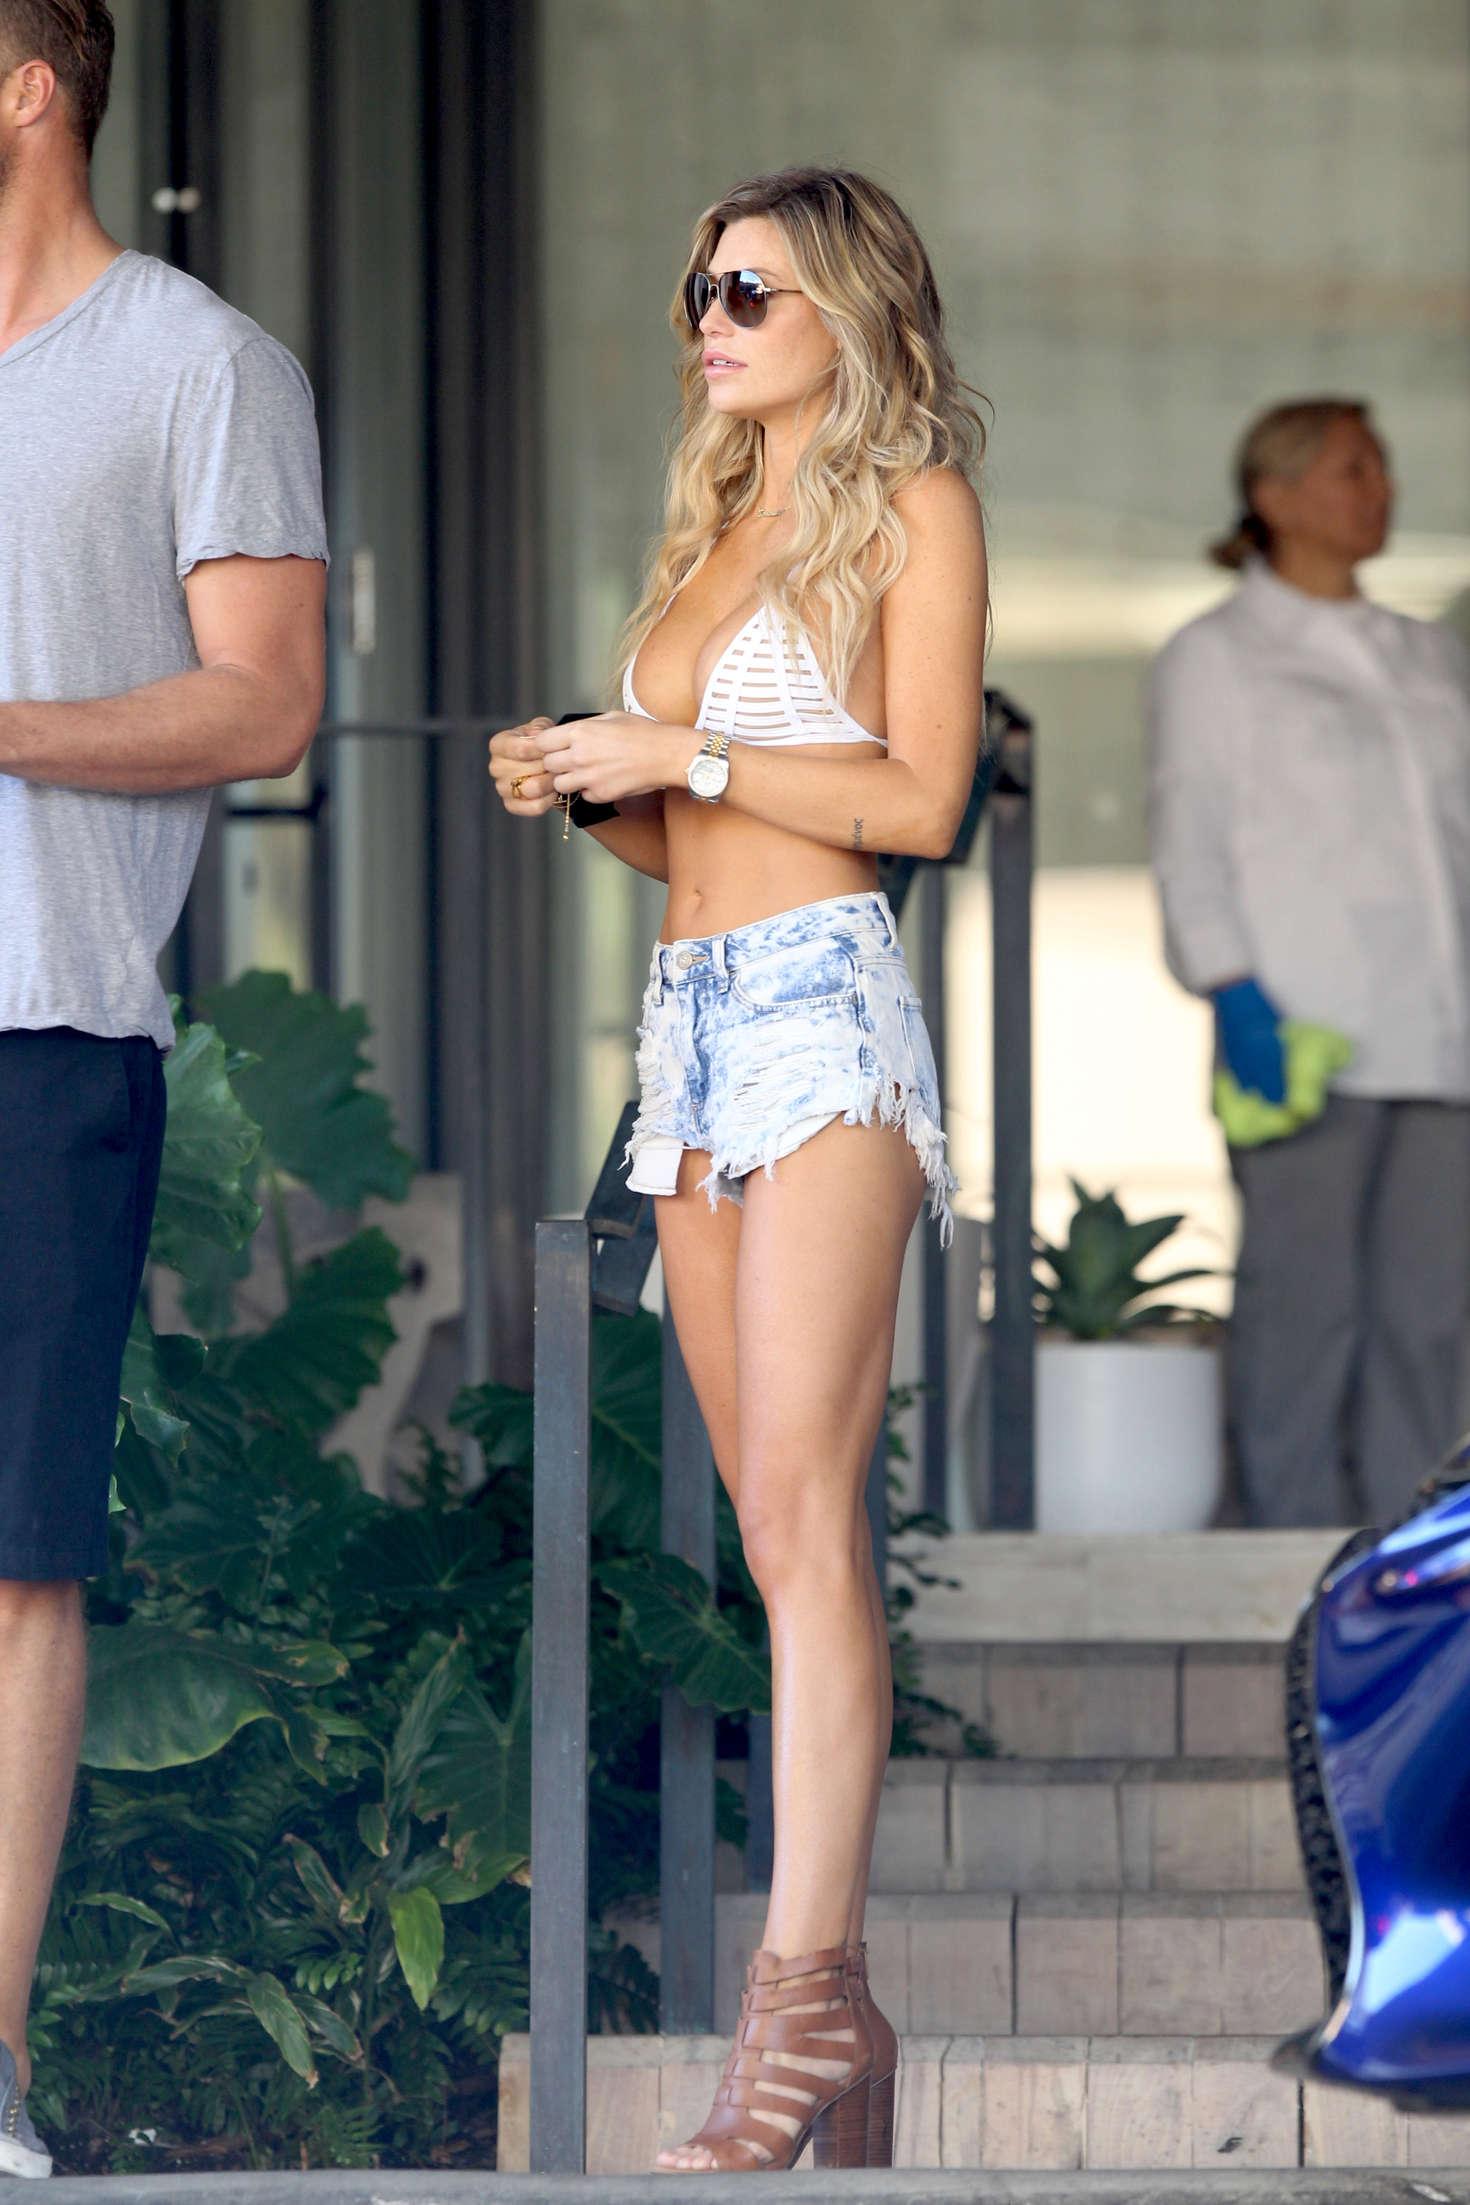 Samantha Hoopes 2016 : Samantha Hoopes in Jeans Shorts and Bikini Top -14